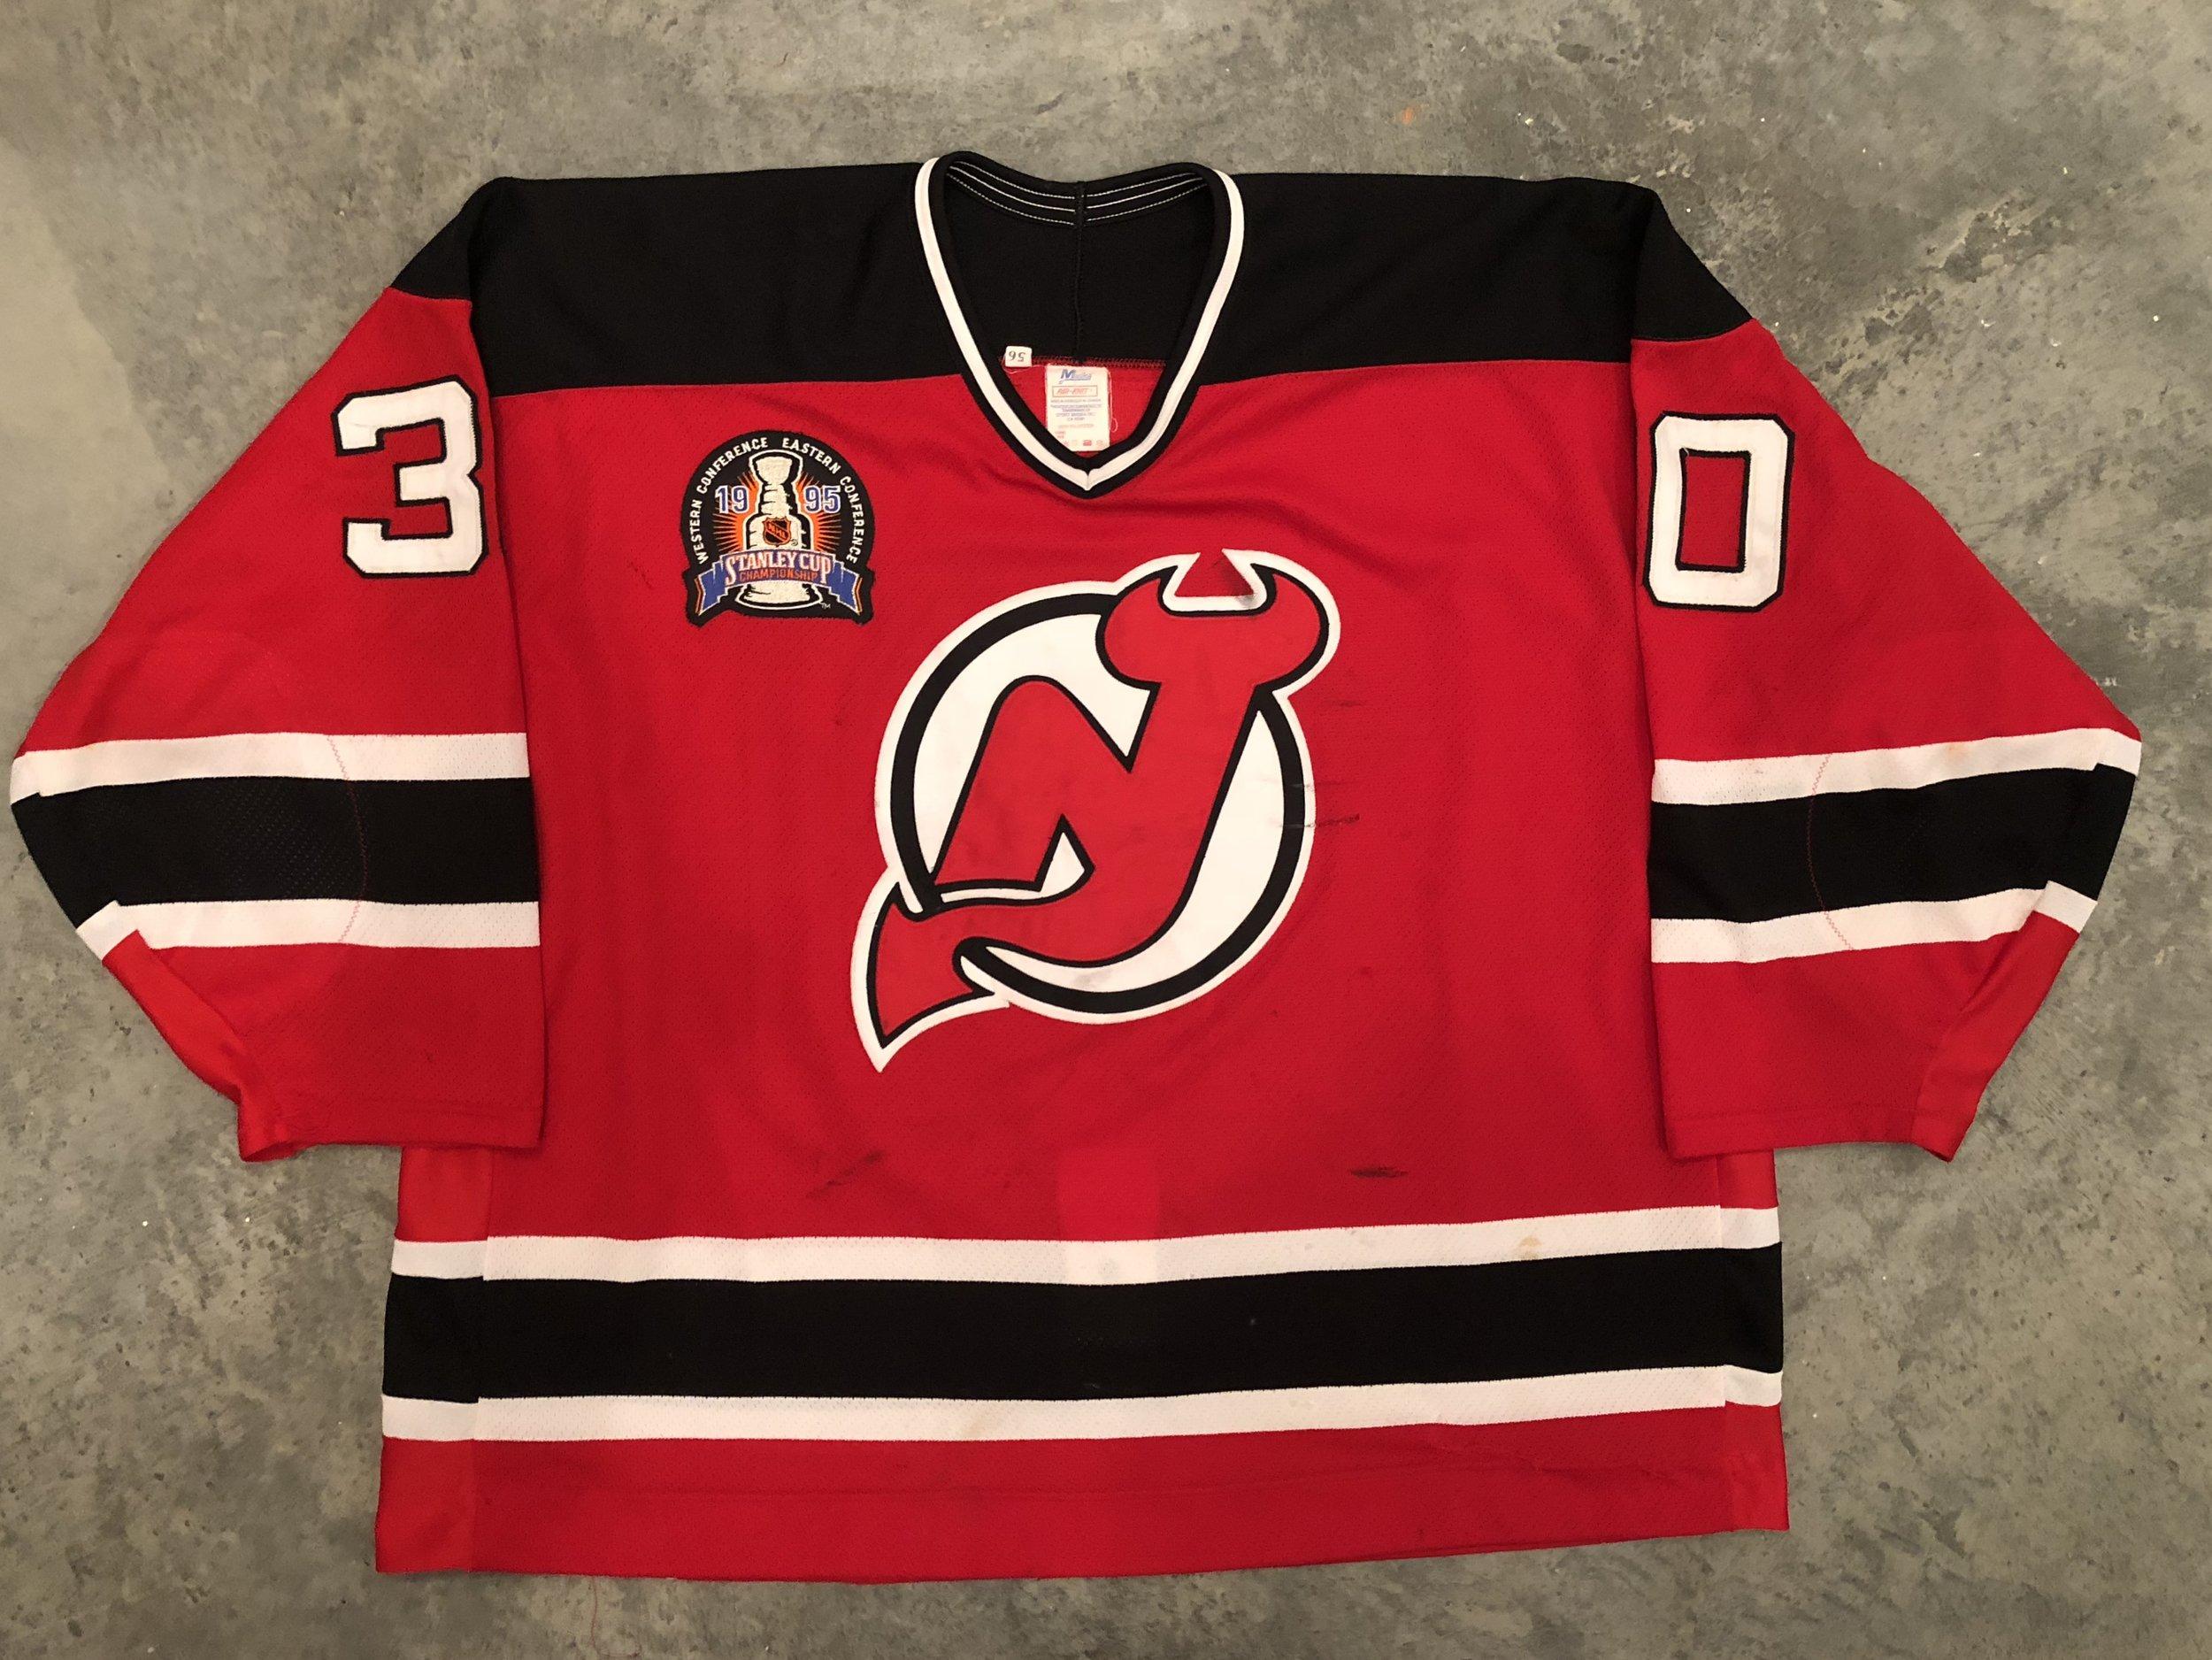 Martin Brodeur New Jersey Devils Game Worn Jersey - 2003, 2004, 2007 & 2008 Vezina Winner